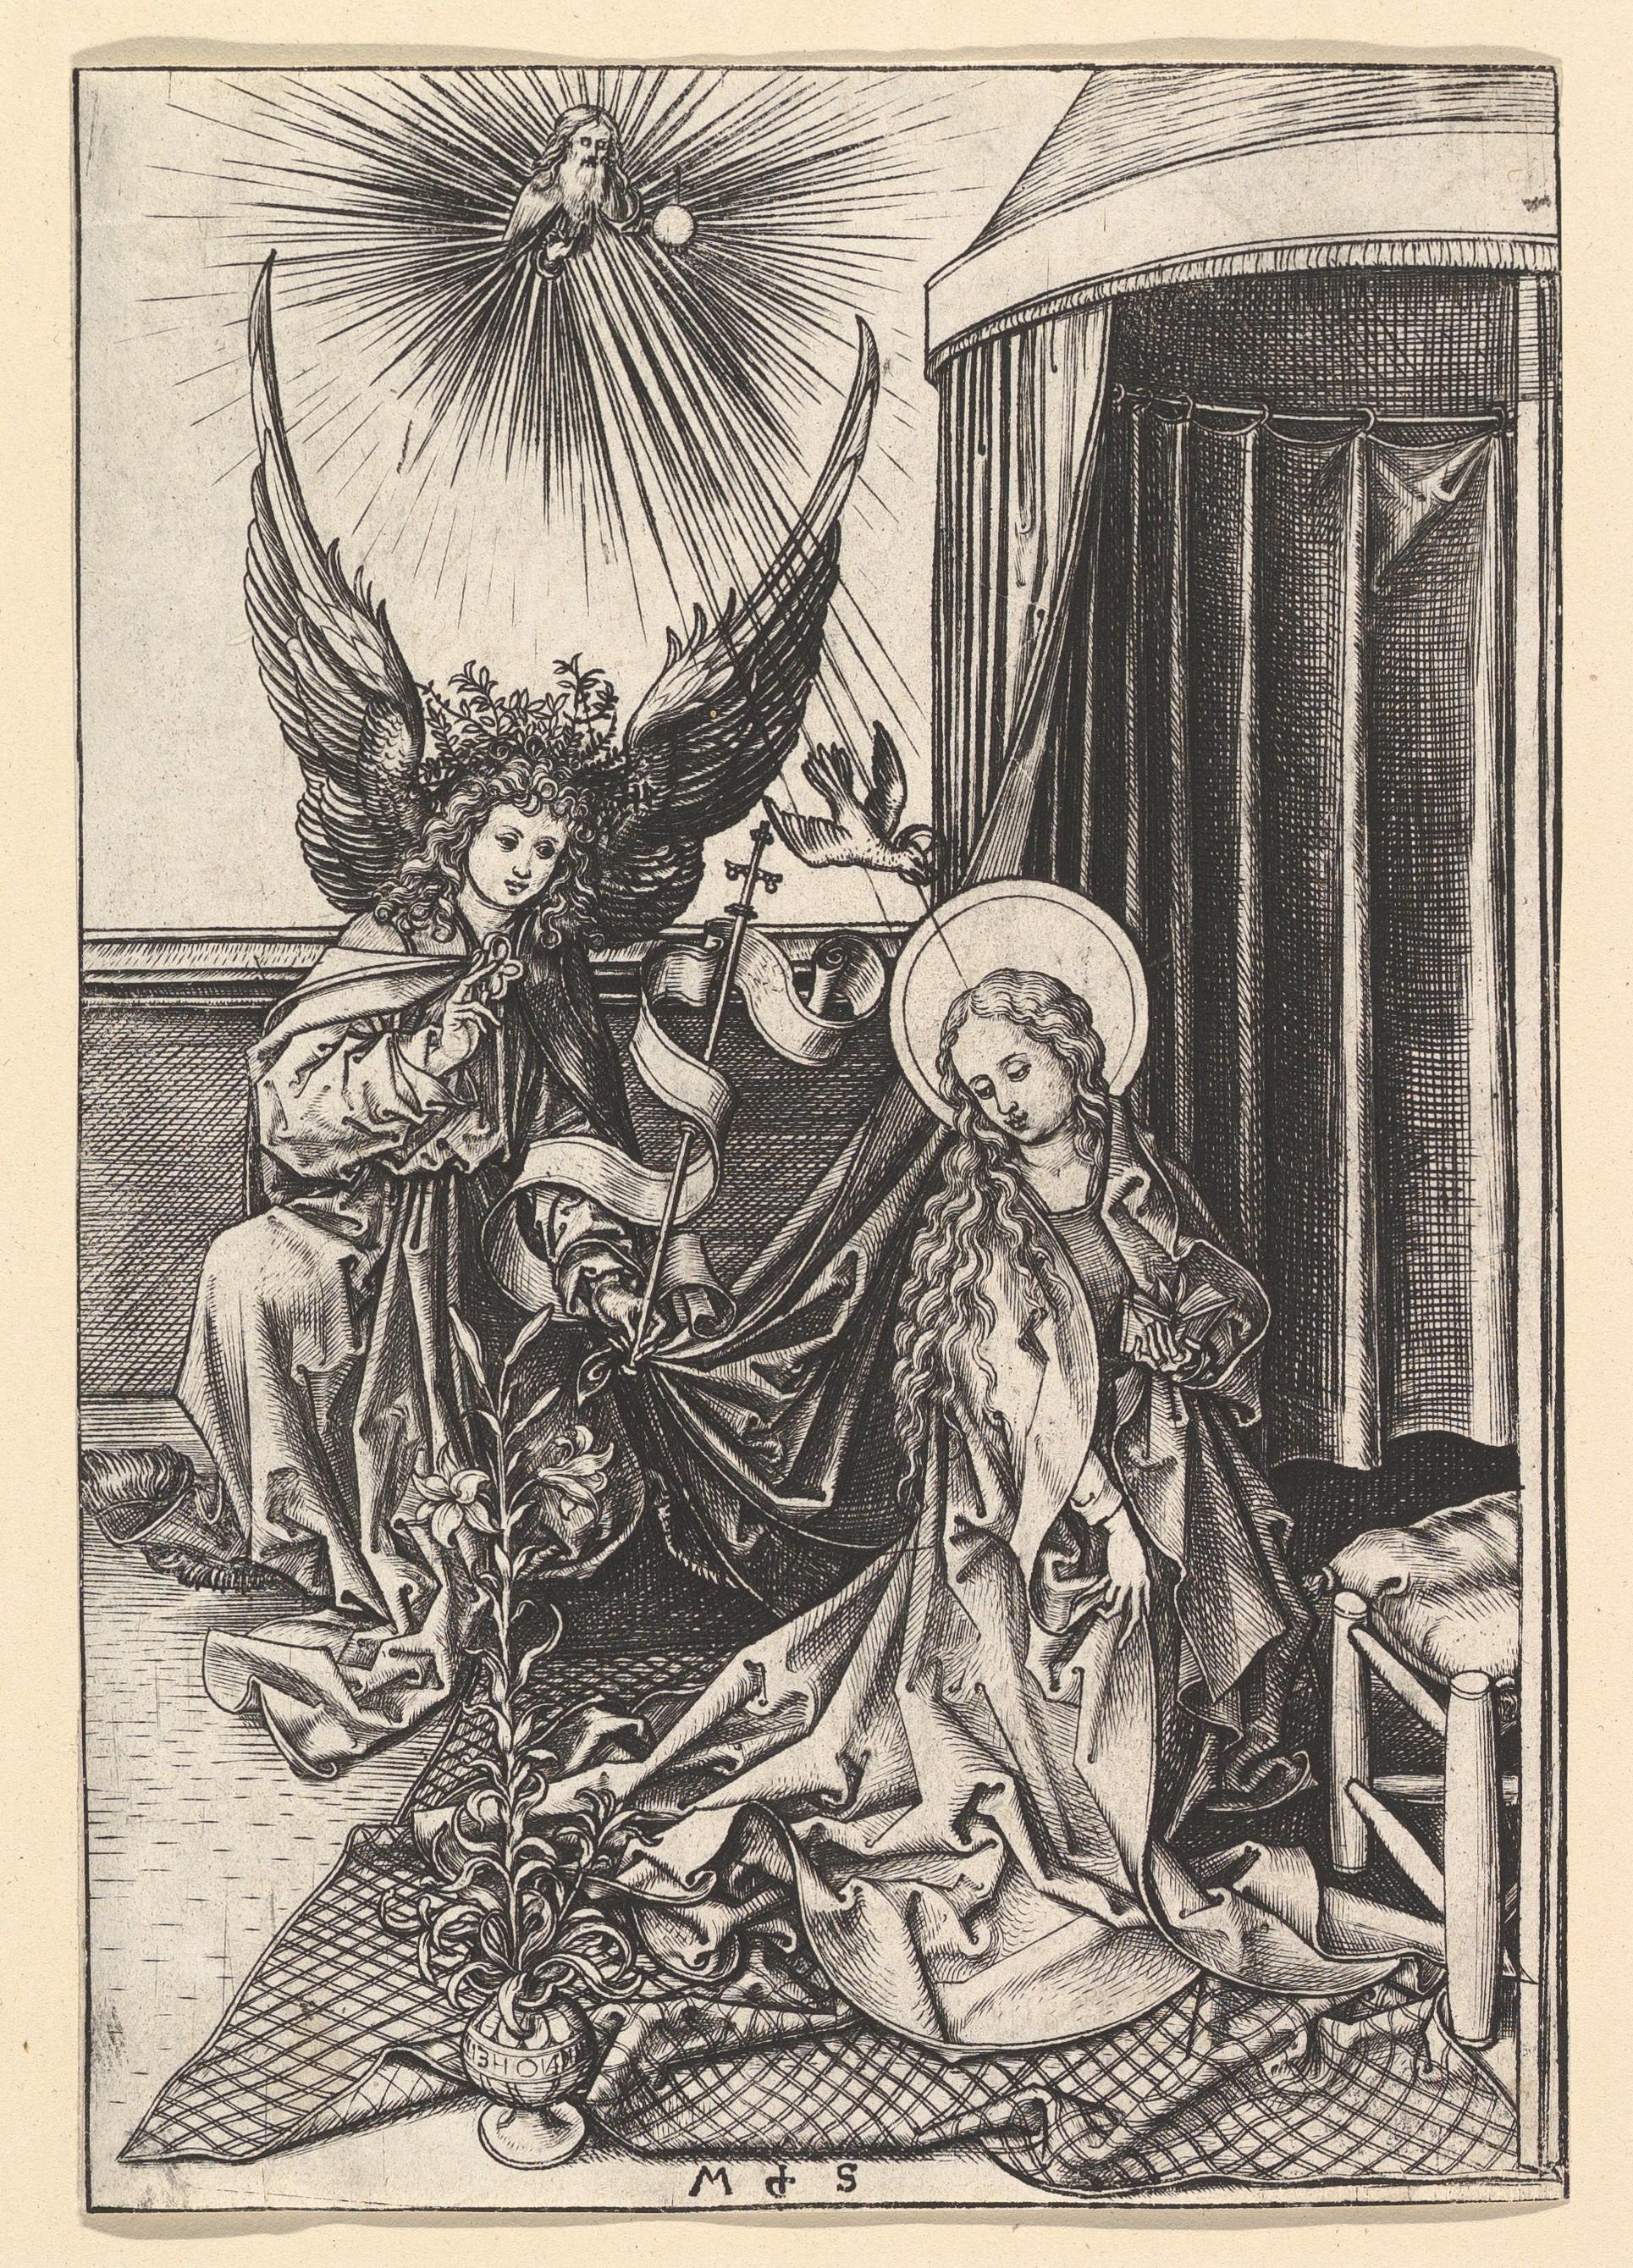 1470-90-martinschongauer-annunciation.jpg